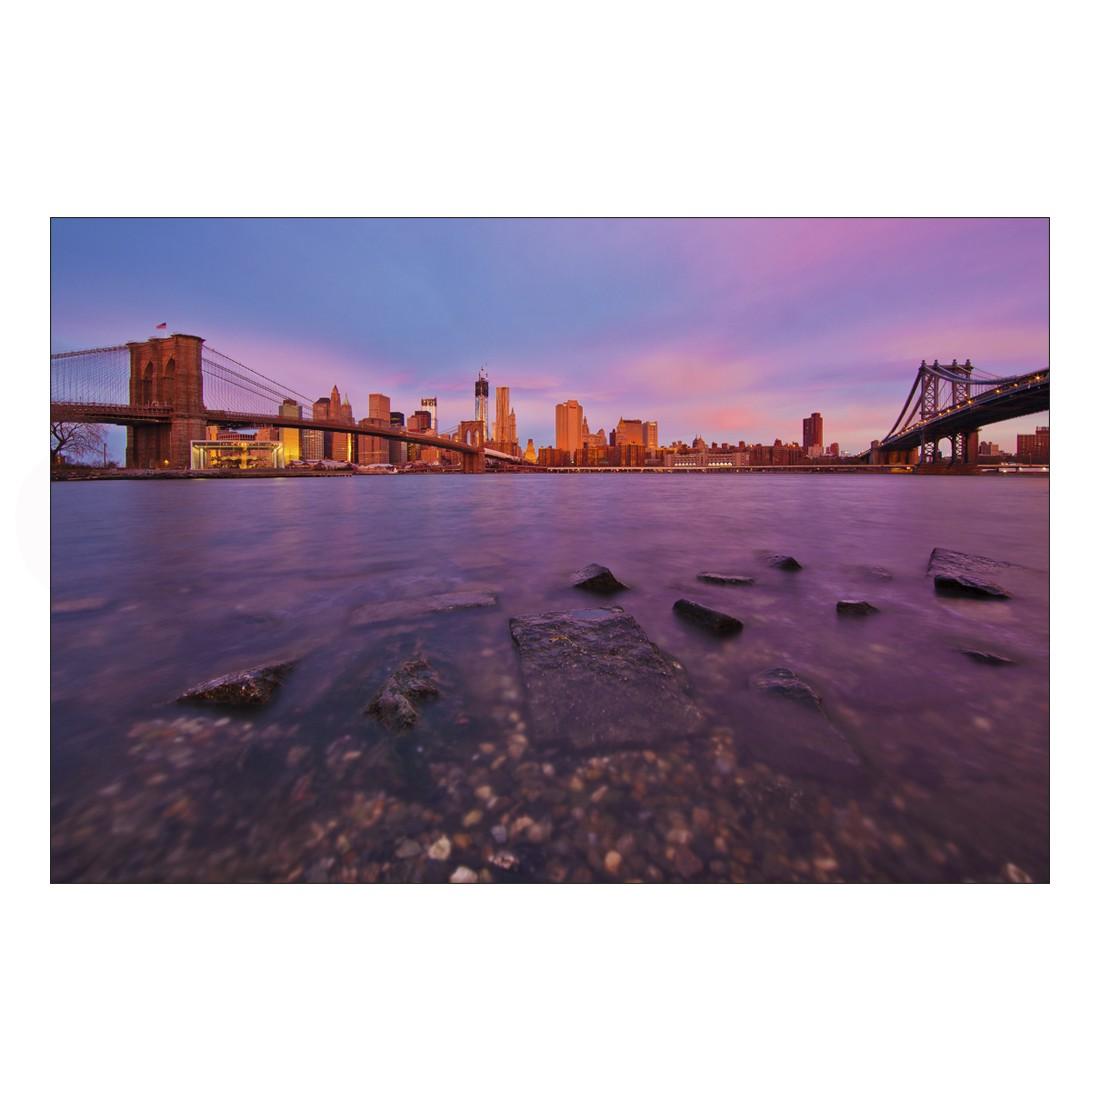 Acrylglasbild City View – Abmessung 60×40 cm, Gallery of Innovative Art online bestellen